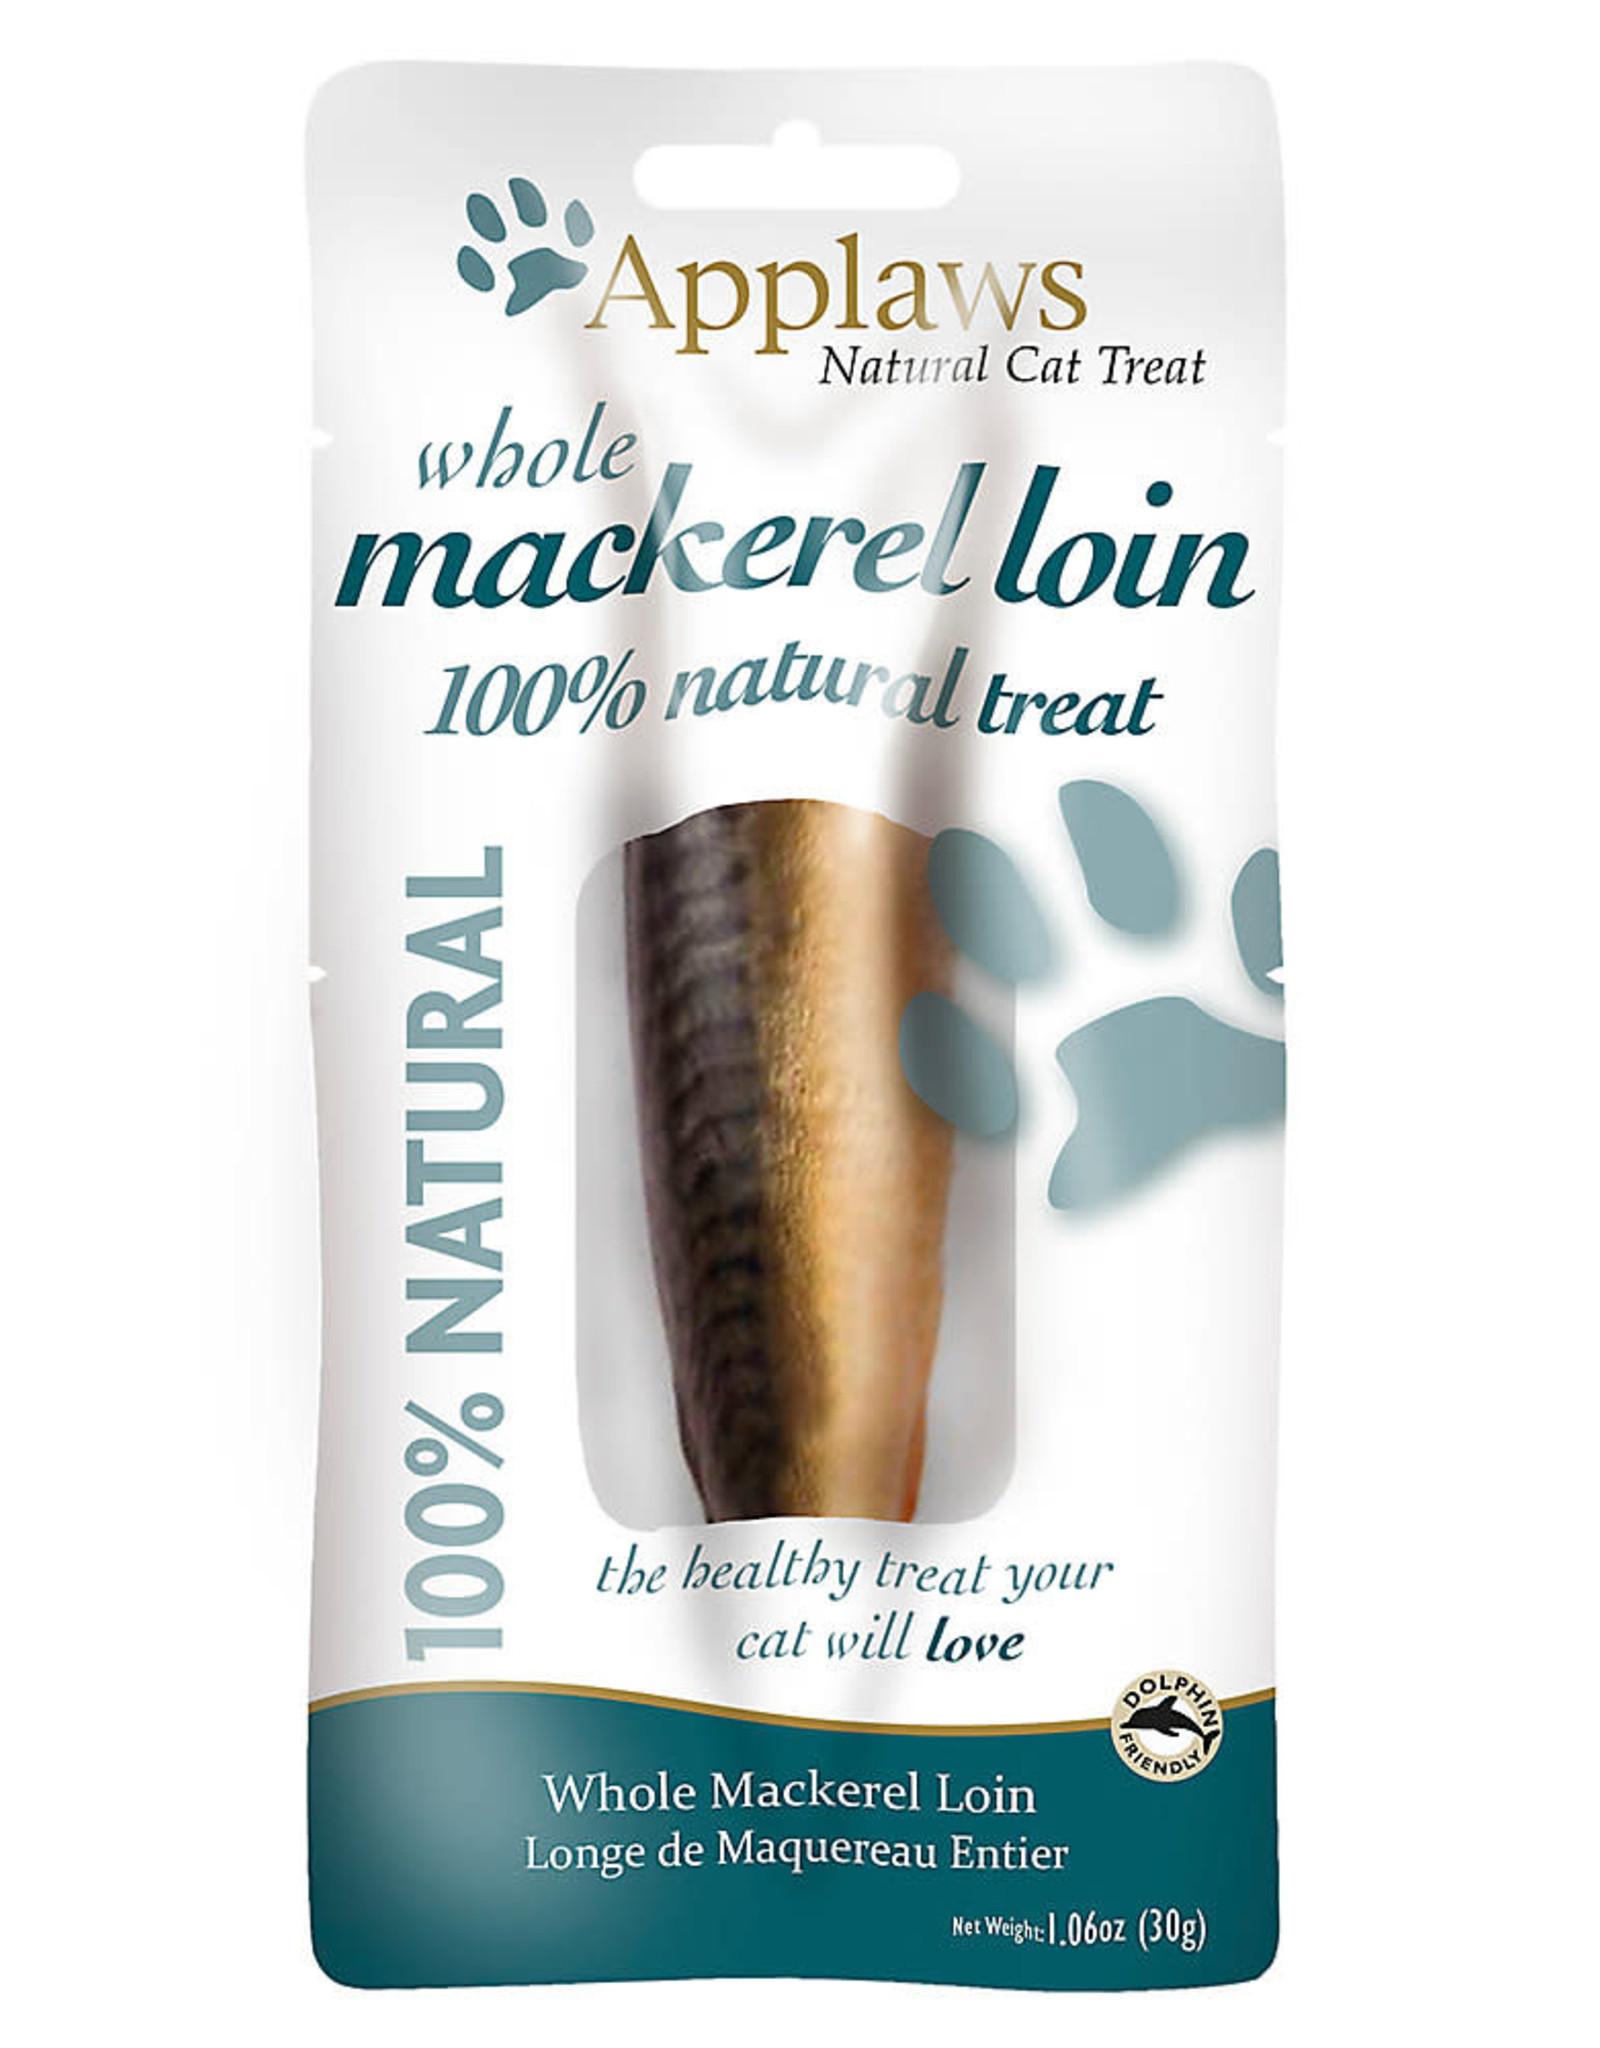 Applaws Applaws Whole Mackerel loin Cat Treat 1.06 oz